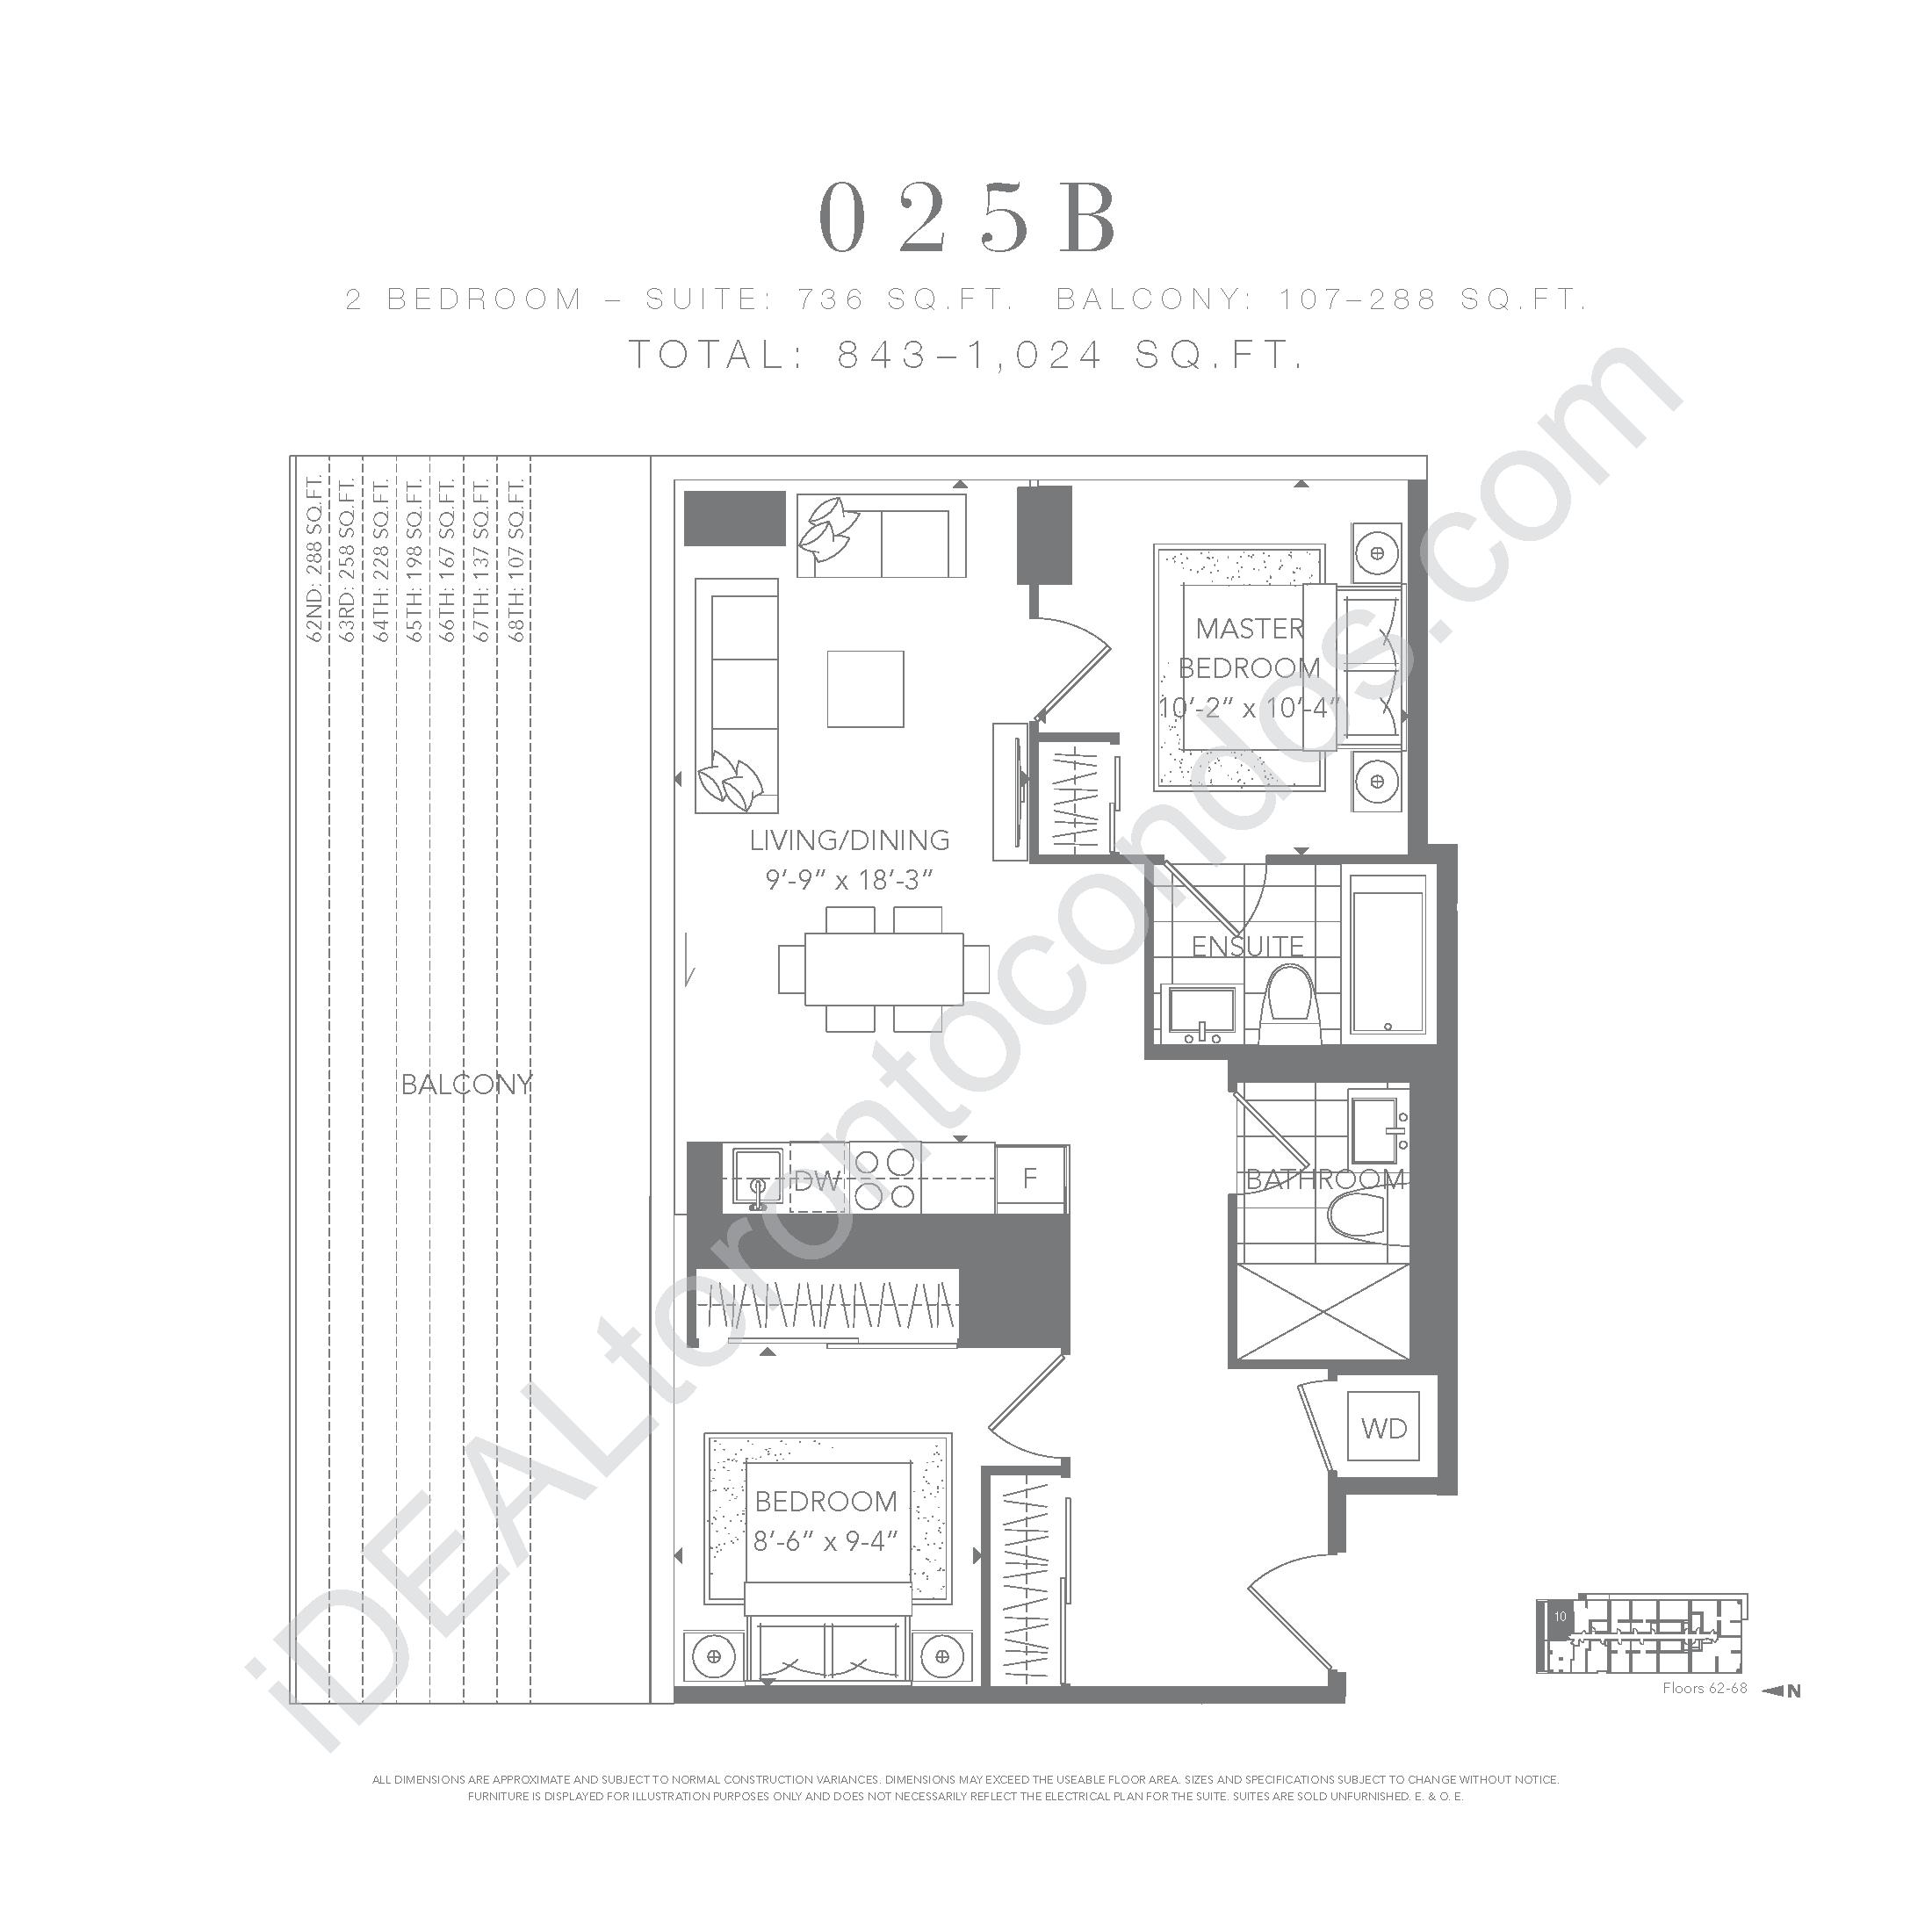 2 bedroom 025 B